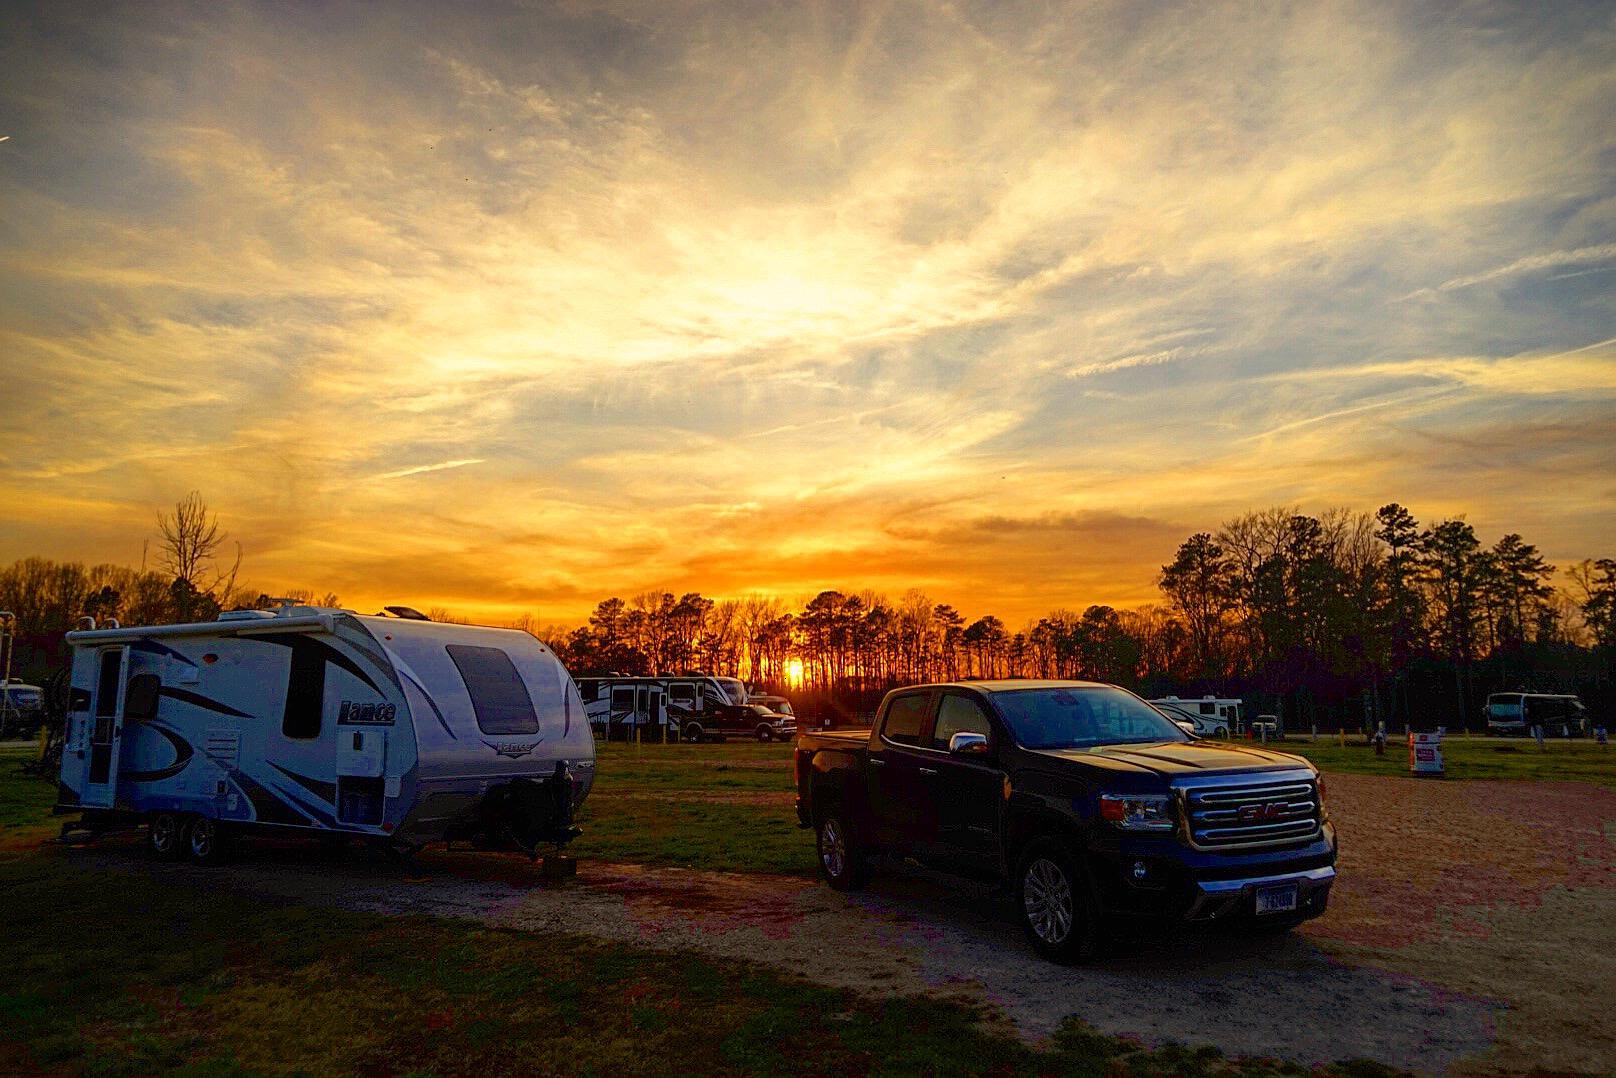 Sunset at the NC Fairgrounds